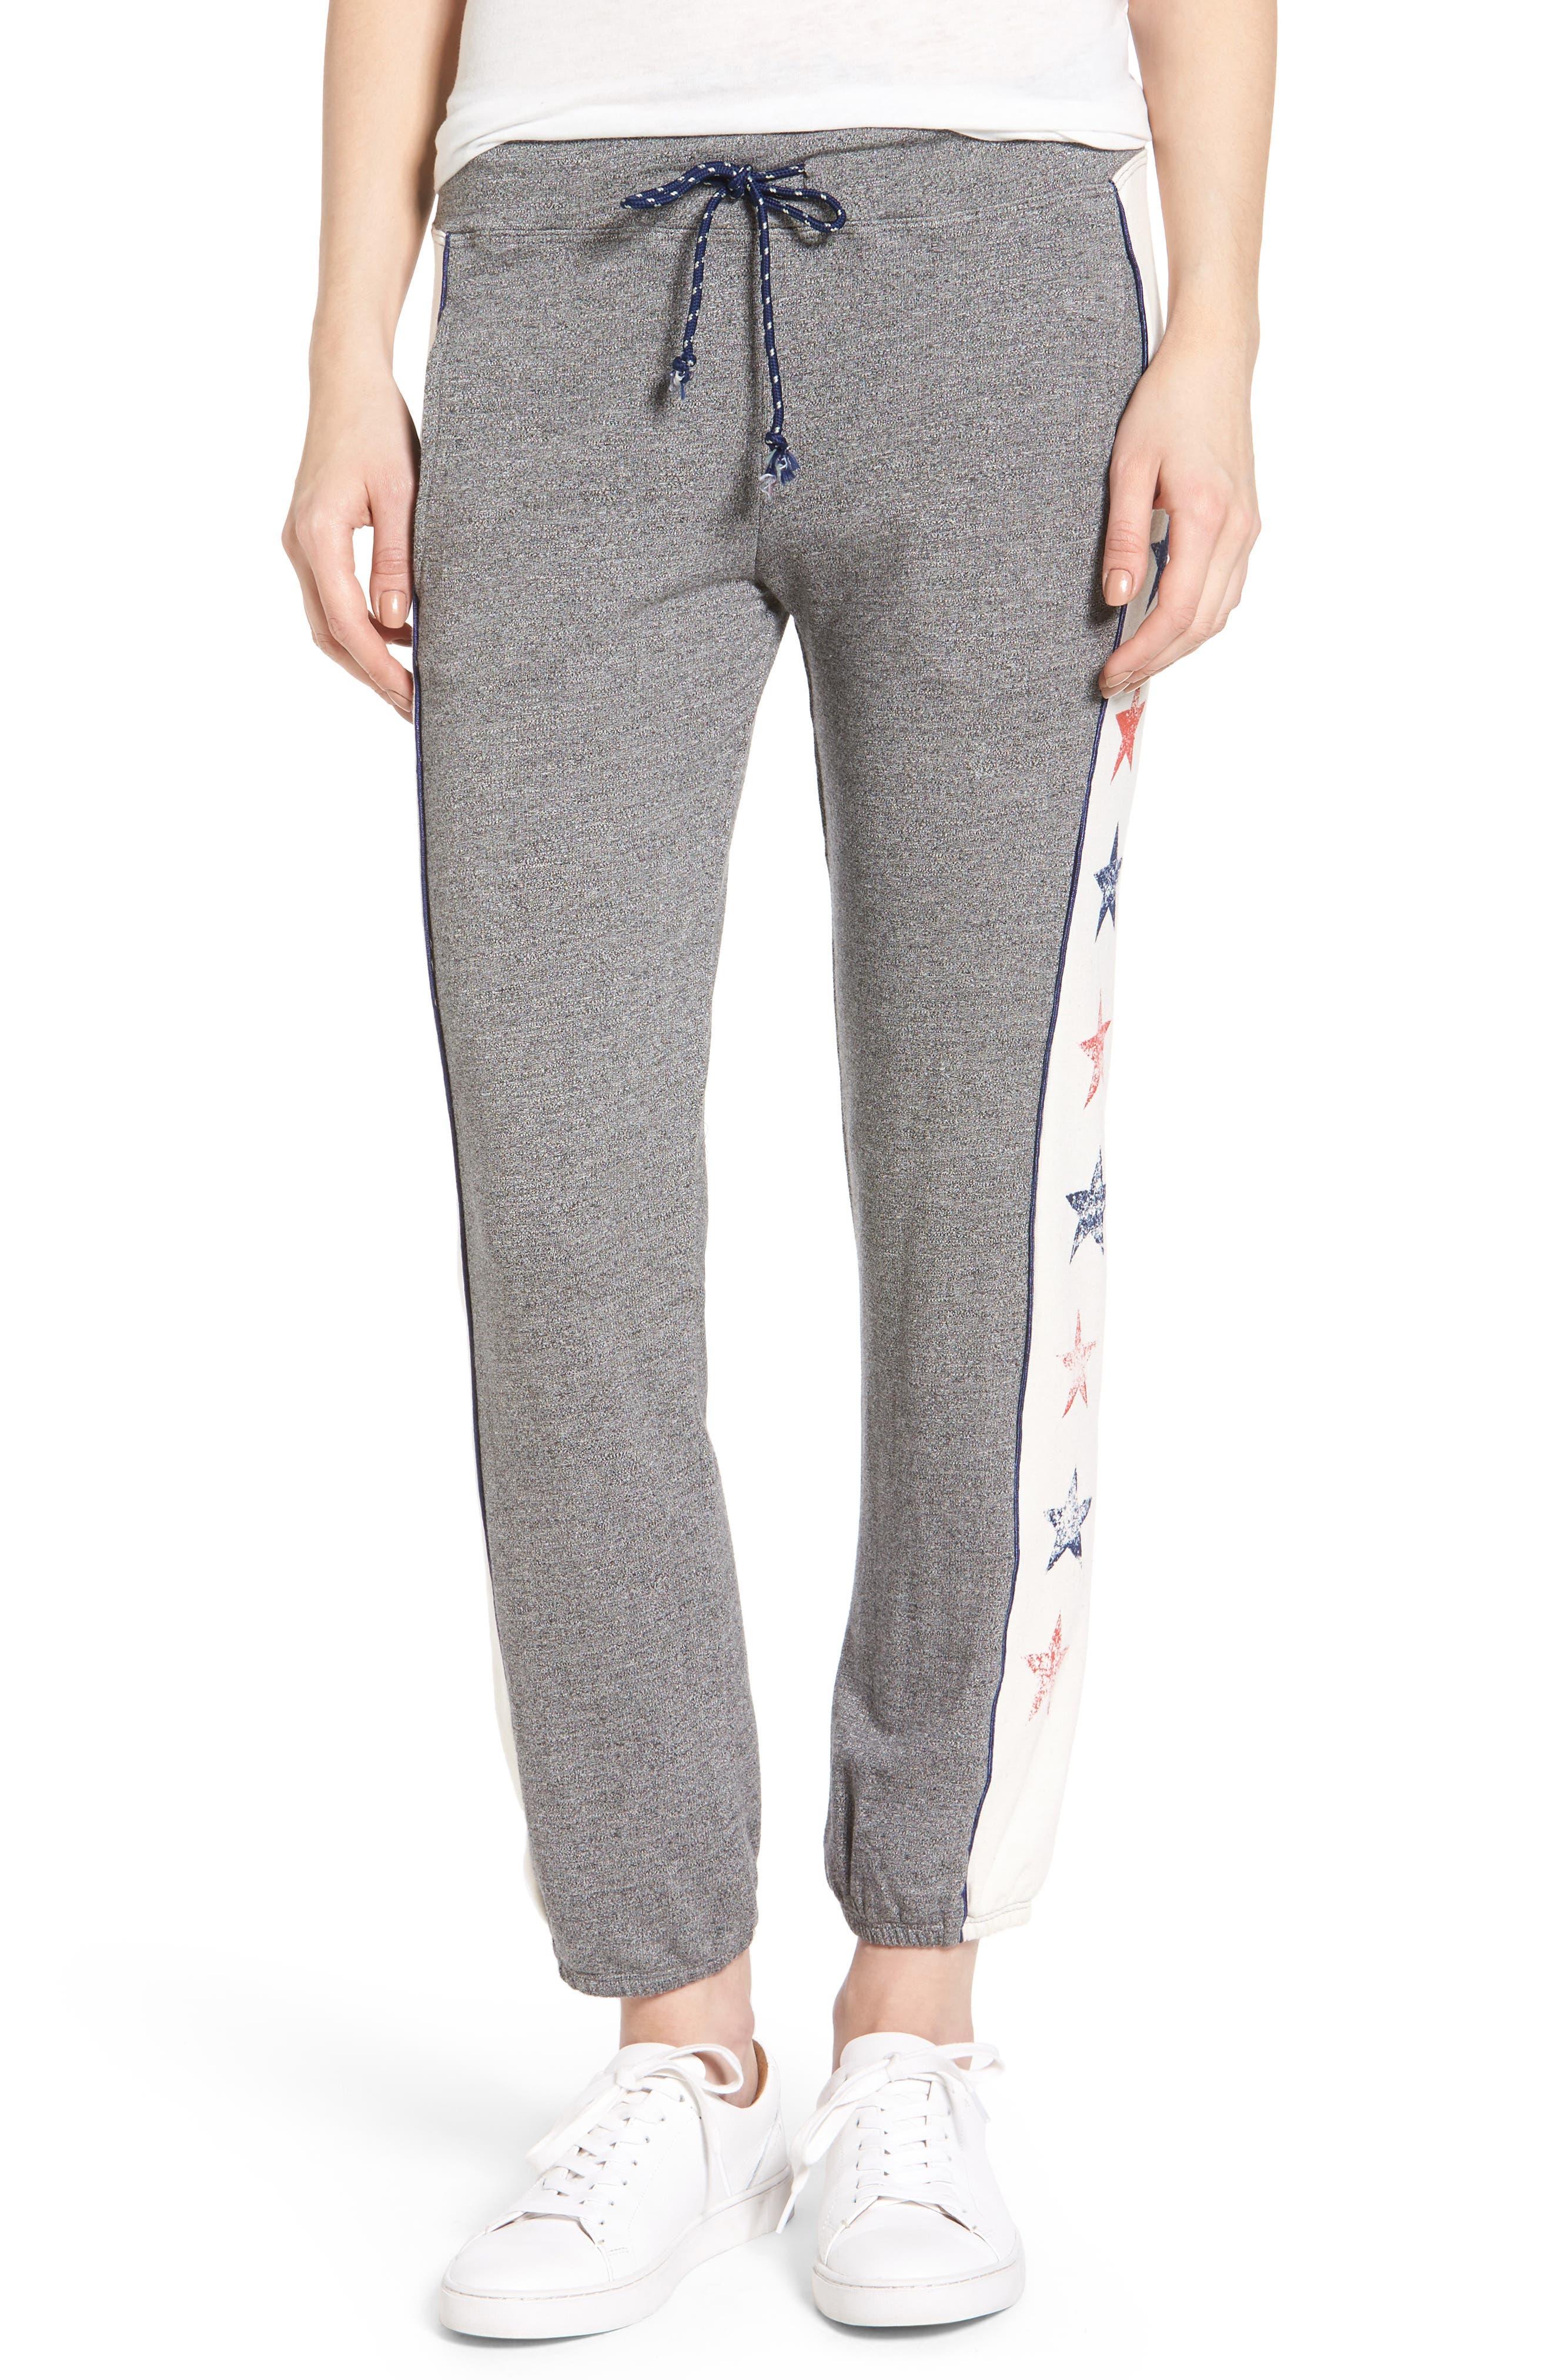 Tumble n Dry Girls Sweatpants Gea Sizes 4-10